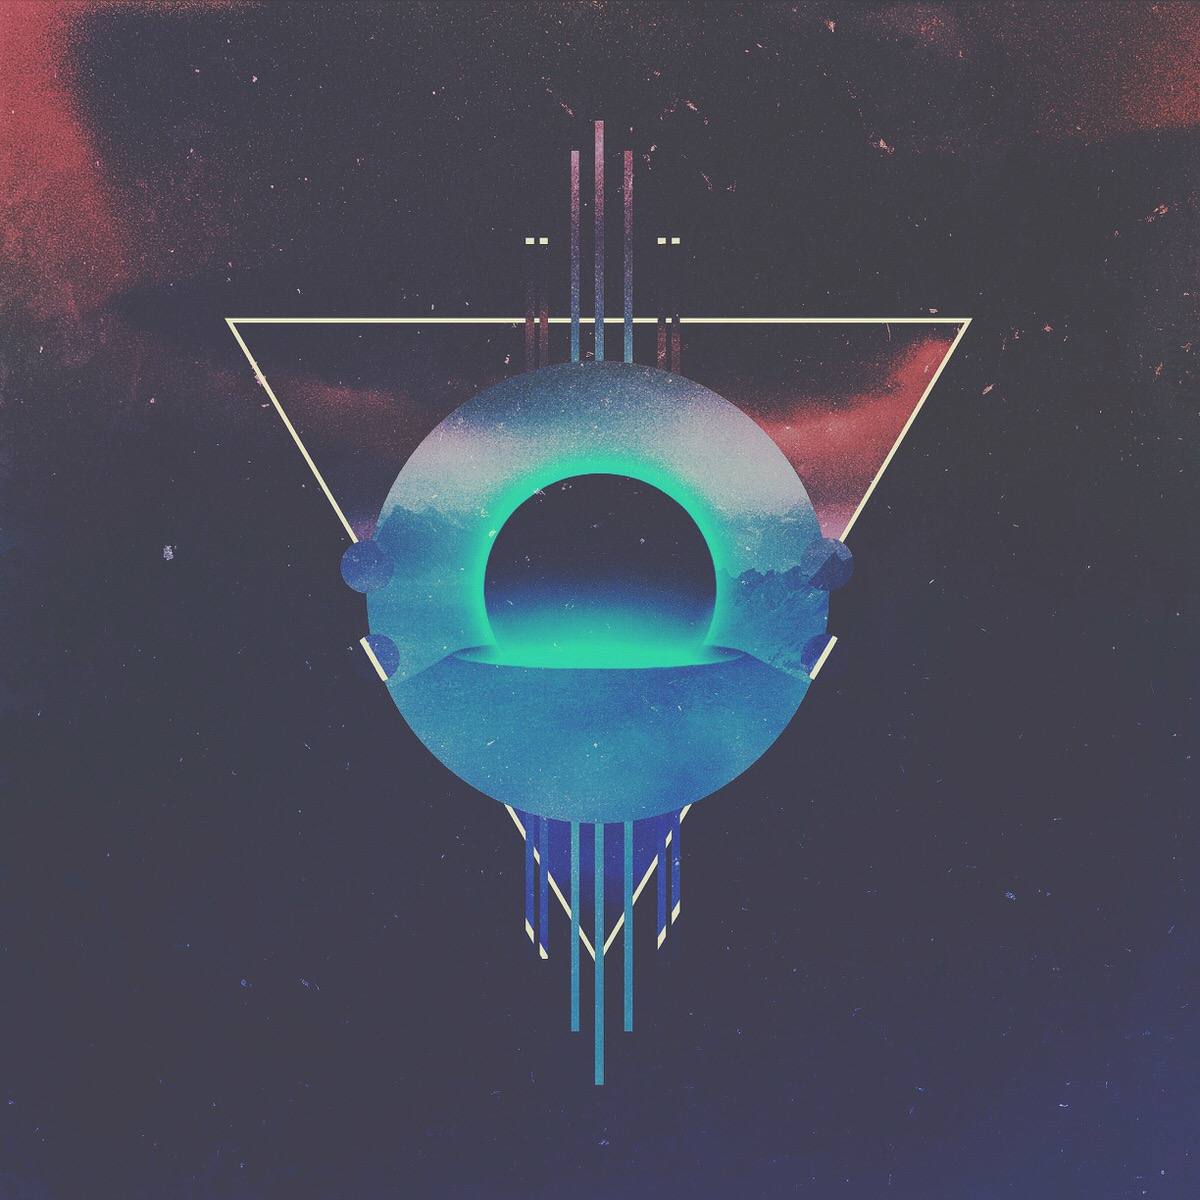 Album Cover Concepts 2016 On Behance